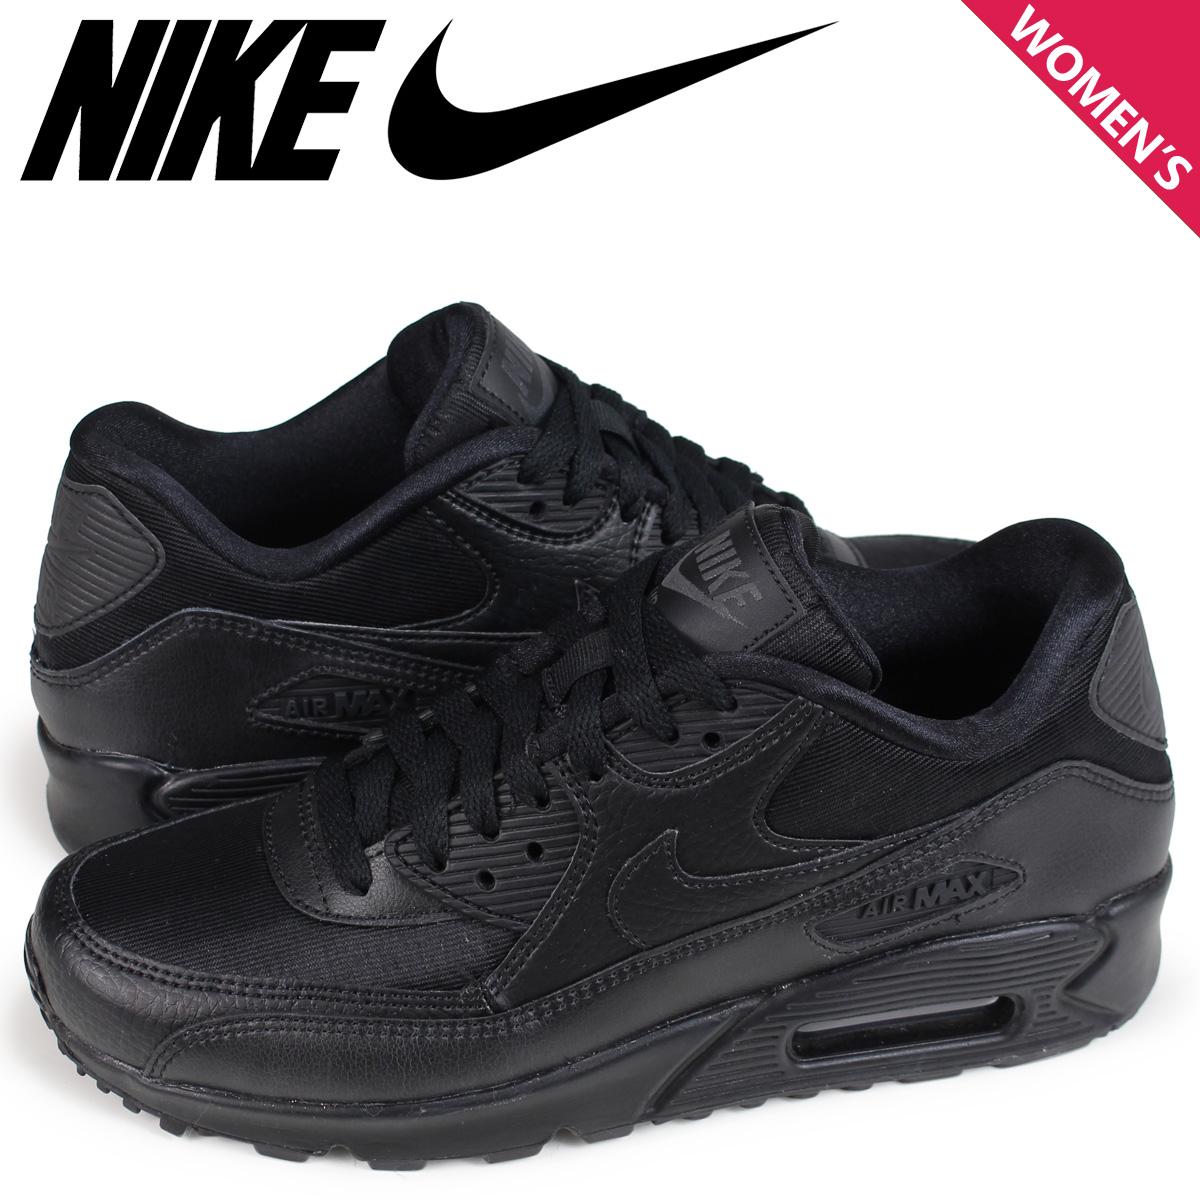 Nike NIKE Air Max 90 Lady's sneakers WMNS AIR MAX 90 325,213 057 black